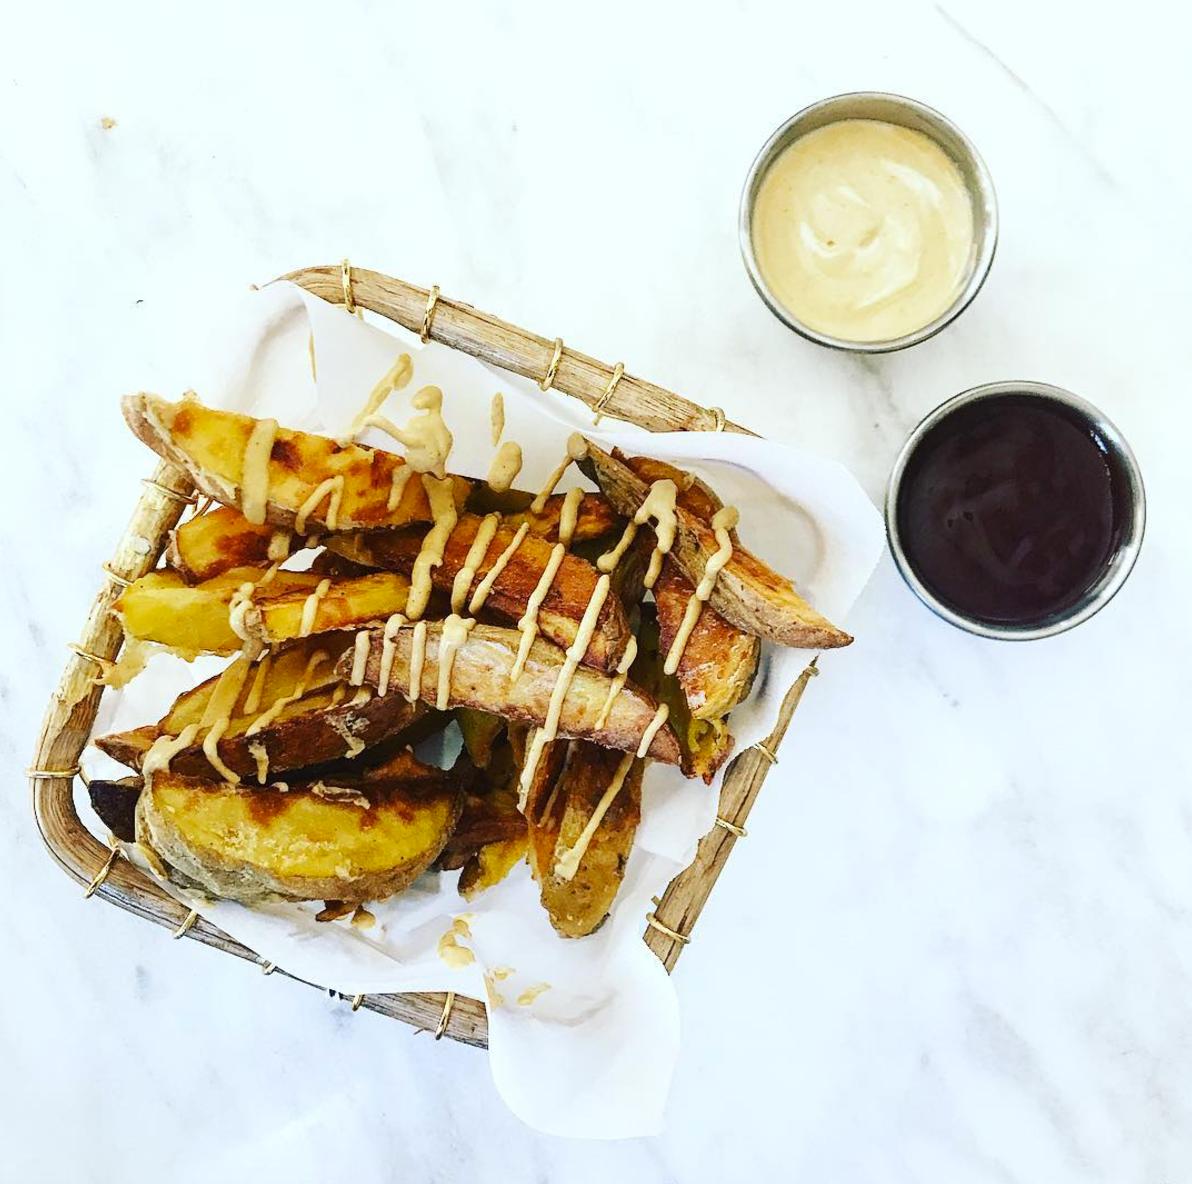 Crispy Fries with Cheesy Sauce